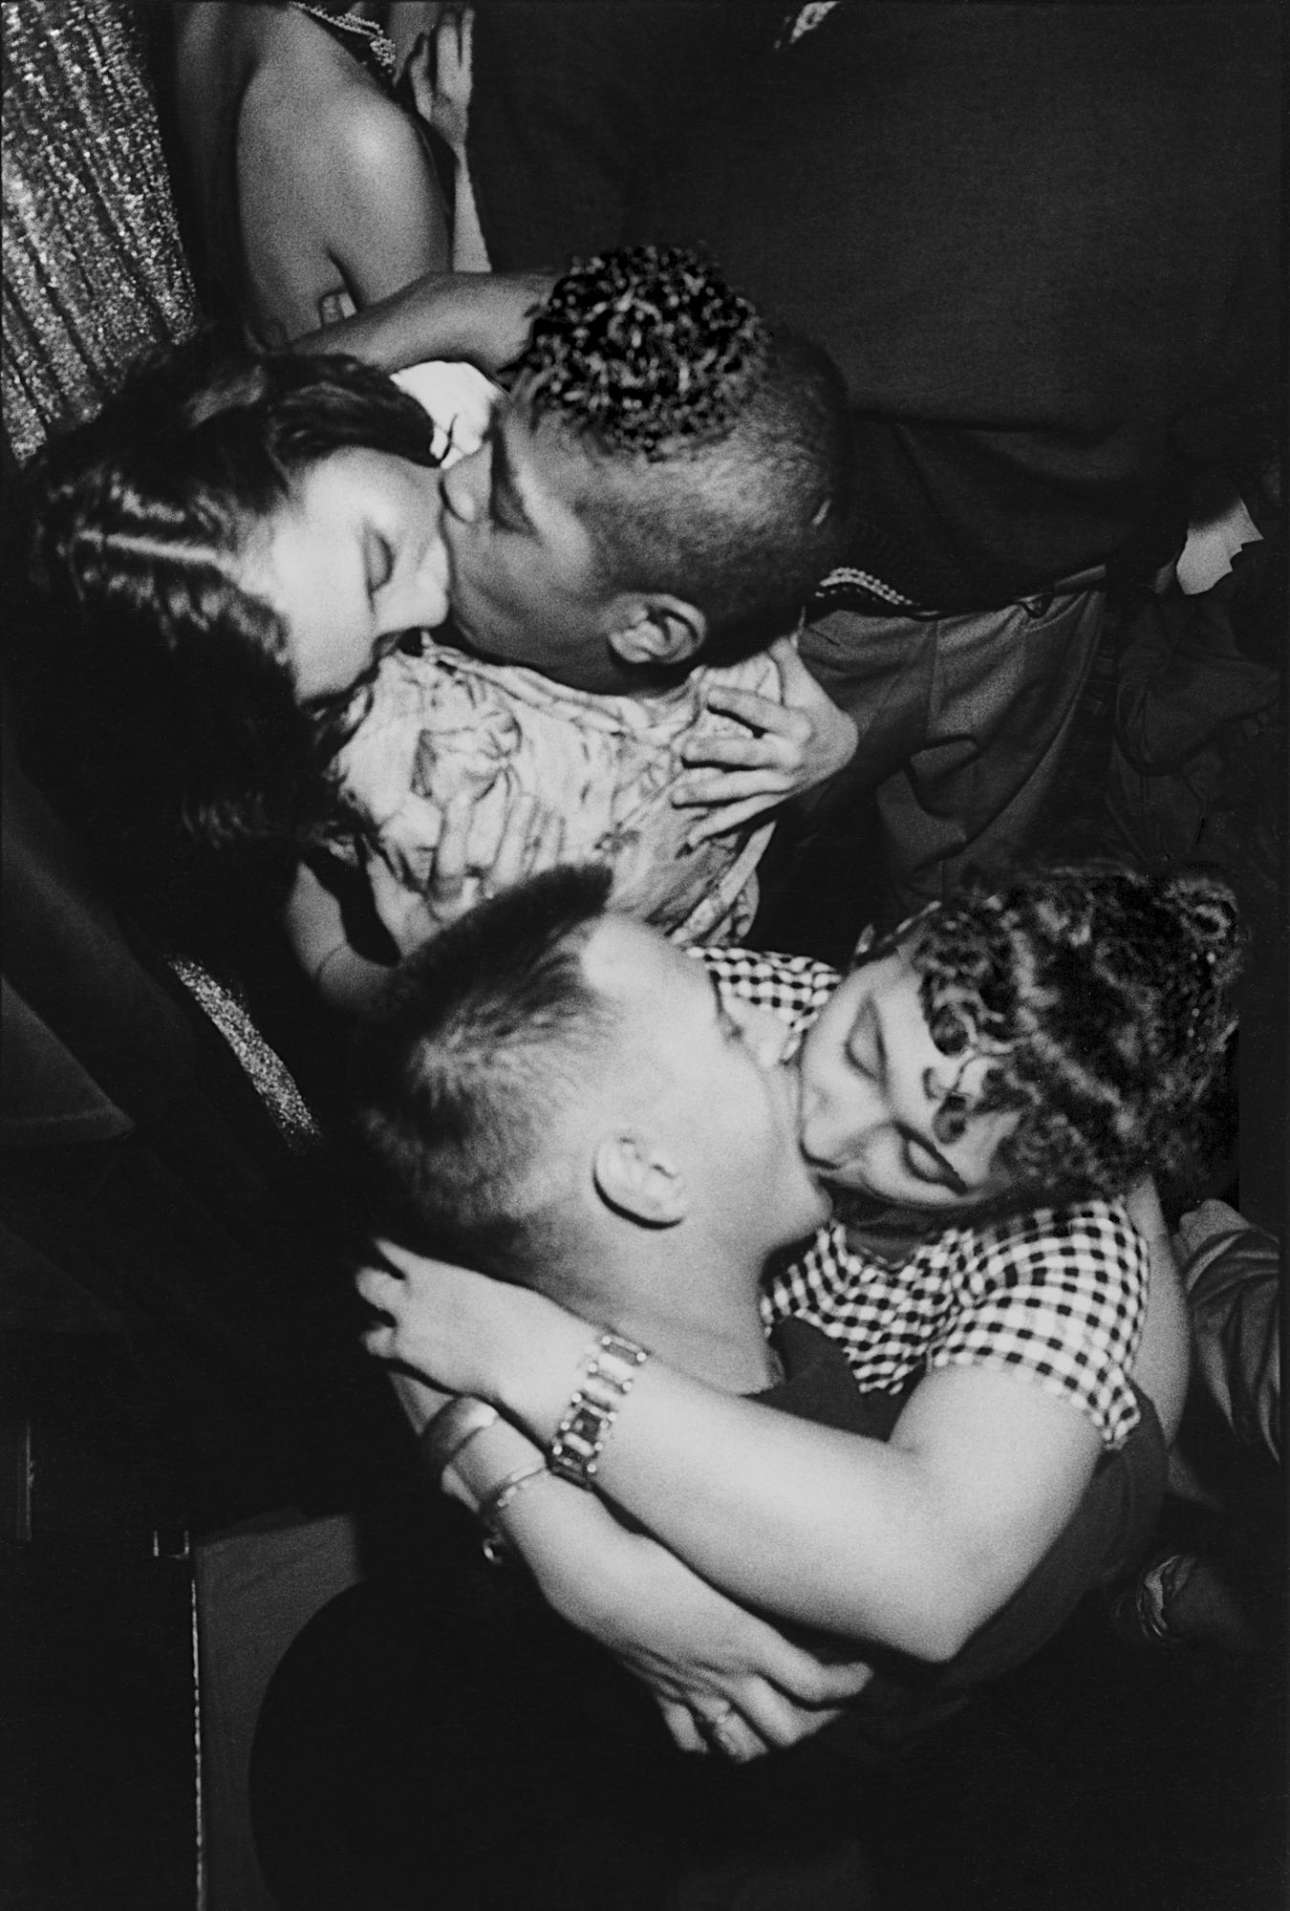 Philippe Chancel, «Xωρίς Τίτλο», 1982. Από τη σειρά Το Παρίσι των Επαναστατών (Rebel's Paris). Ο γάλλος φωτογράφος απαθανατίζει πολυφυλετικές συμμορίες και την καθημερινότητά τους στο Παρίσι της δεκαετίας του '80